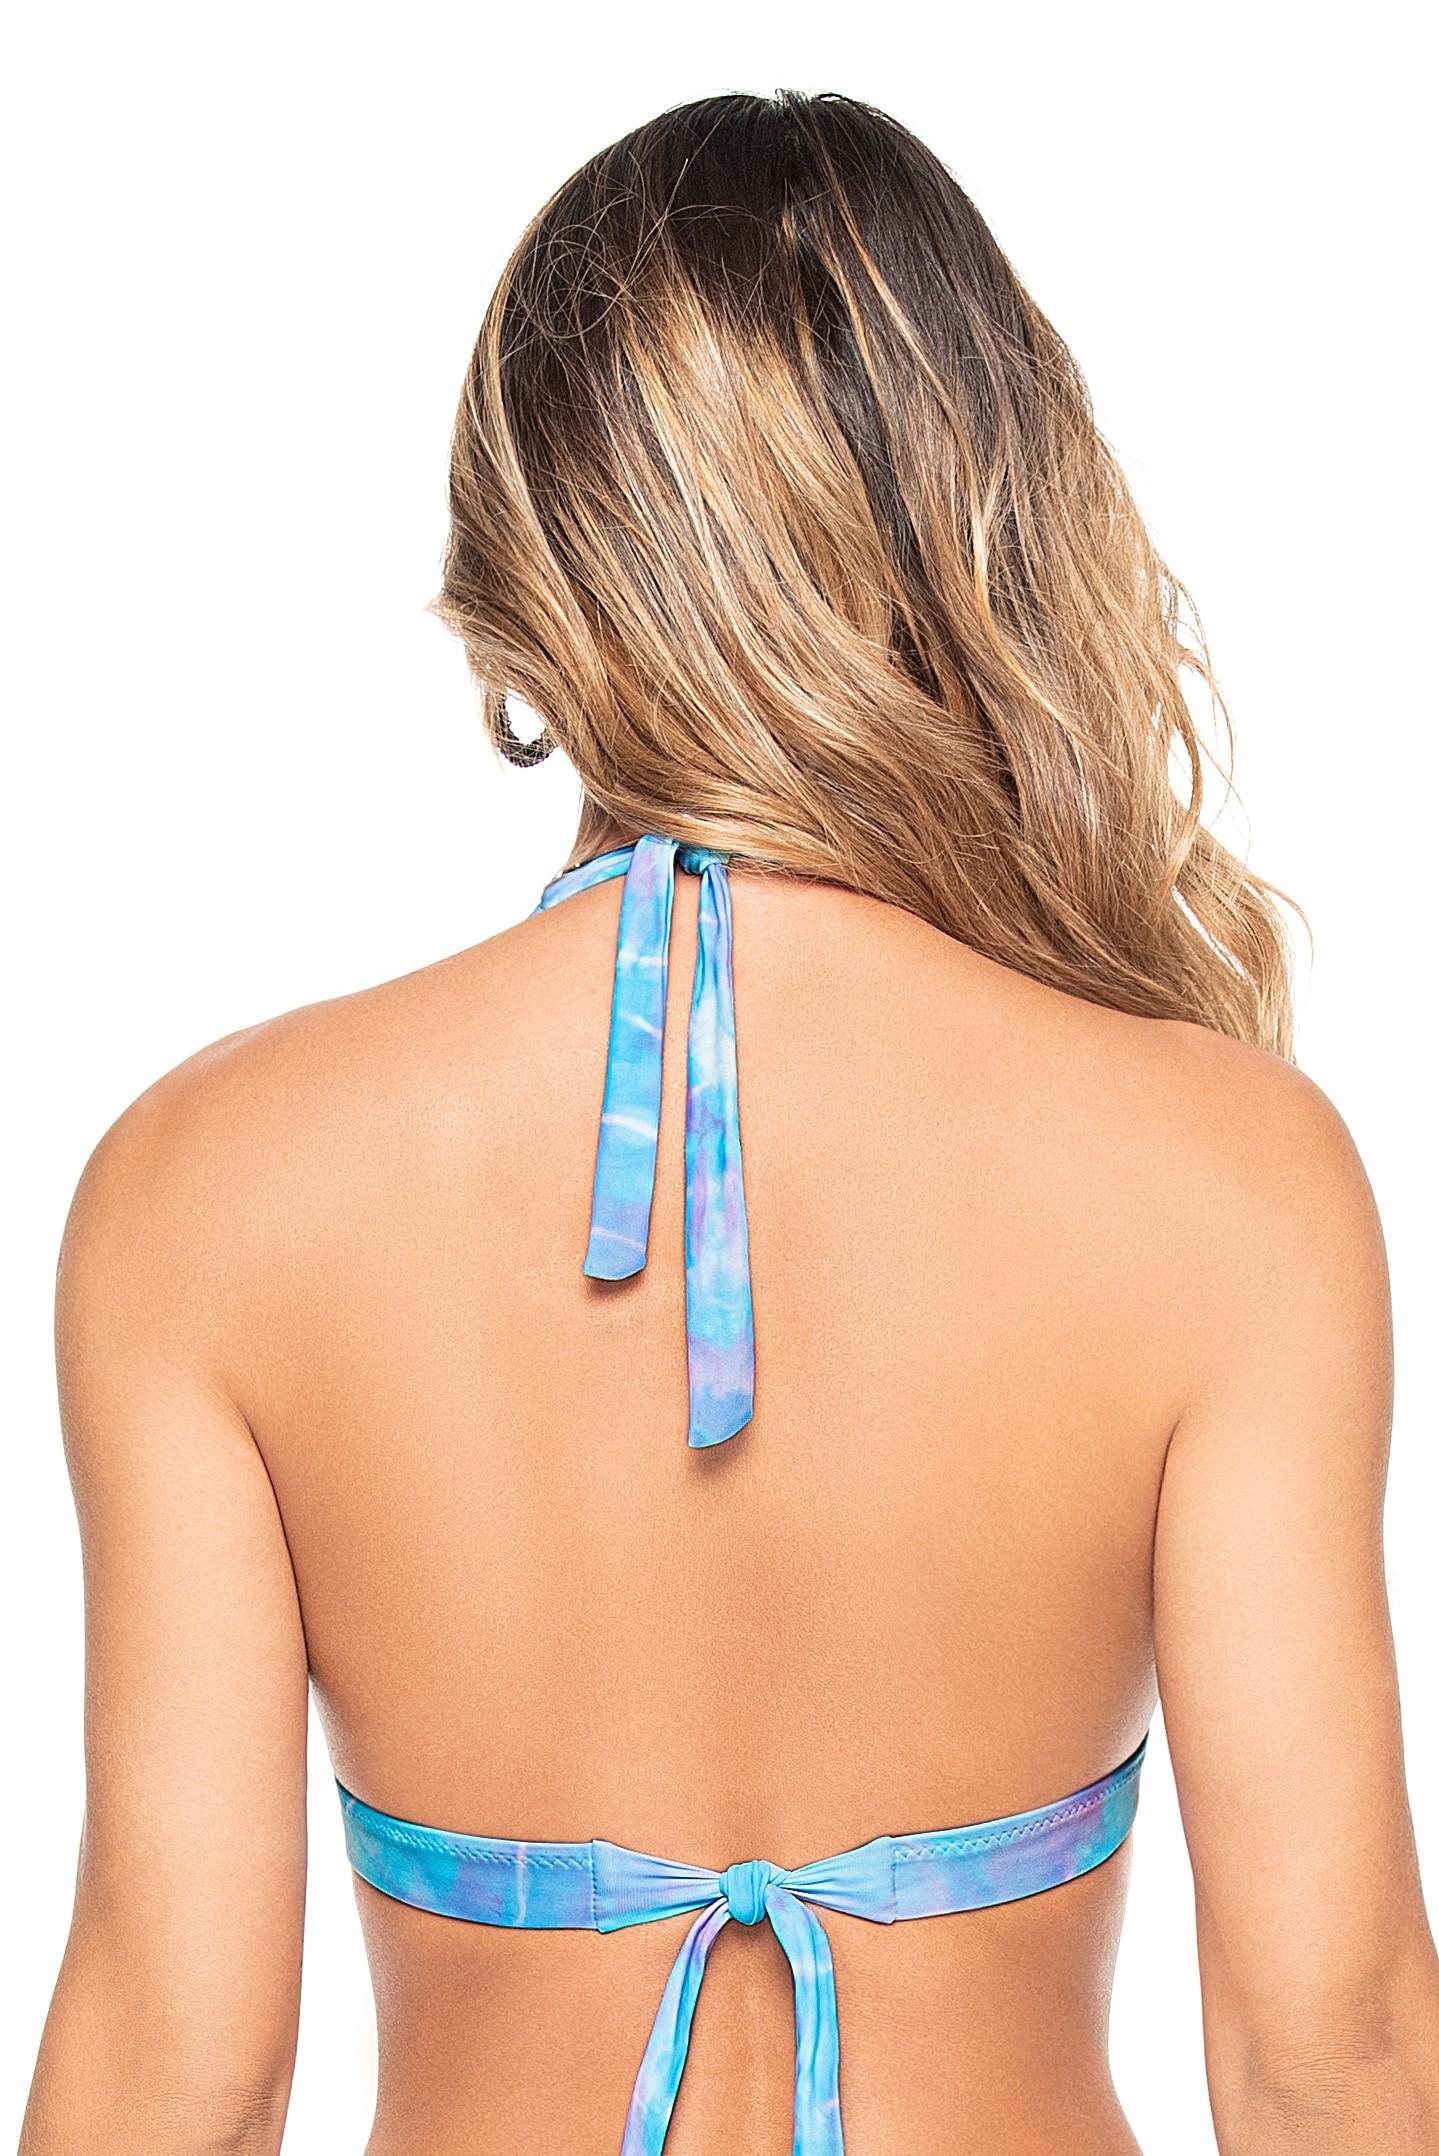 Phax Bella Iceland Blue Tie Dye Halter Bikini Top